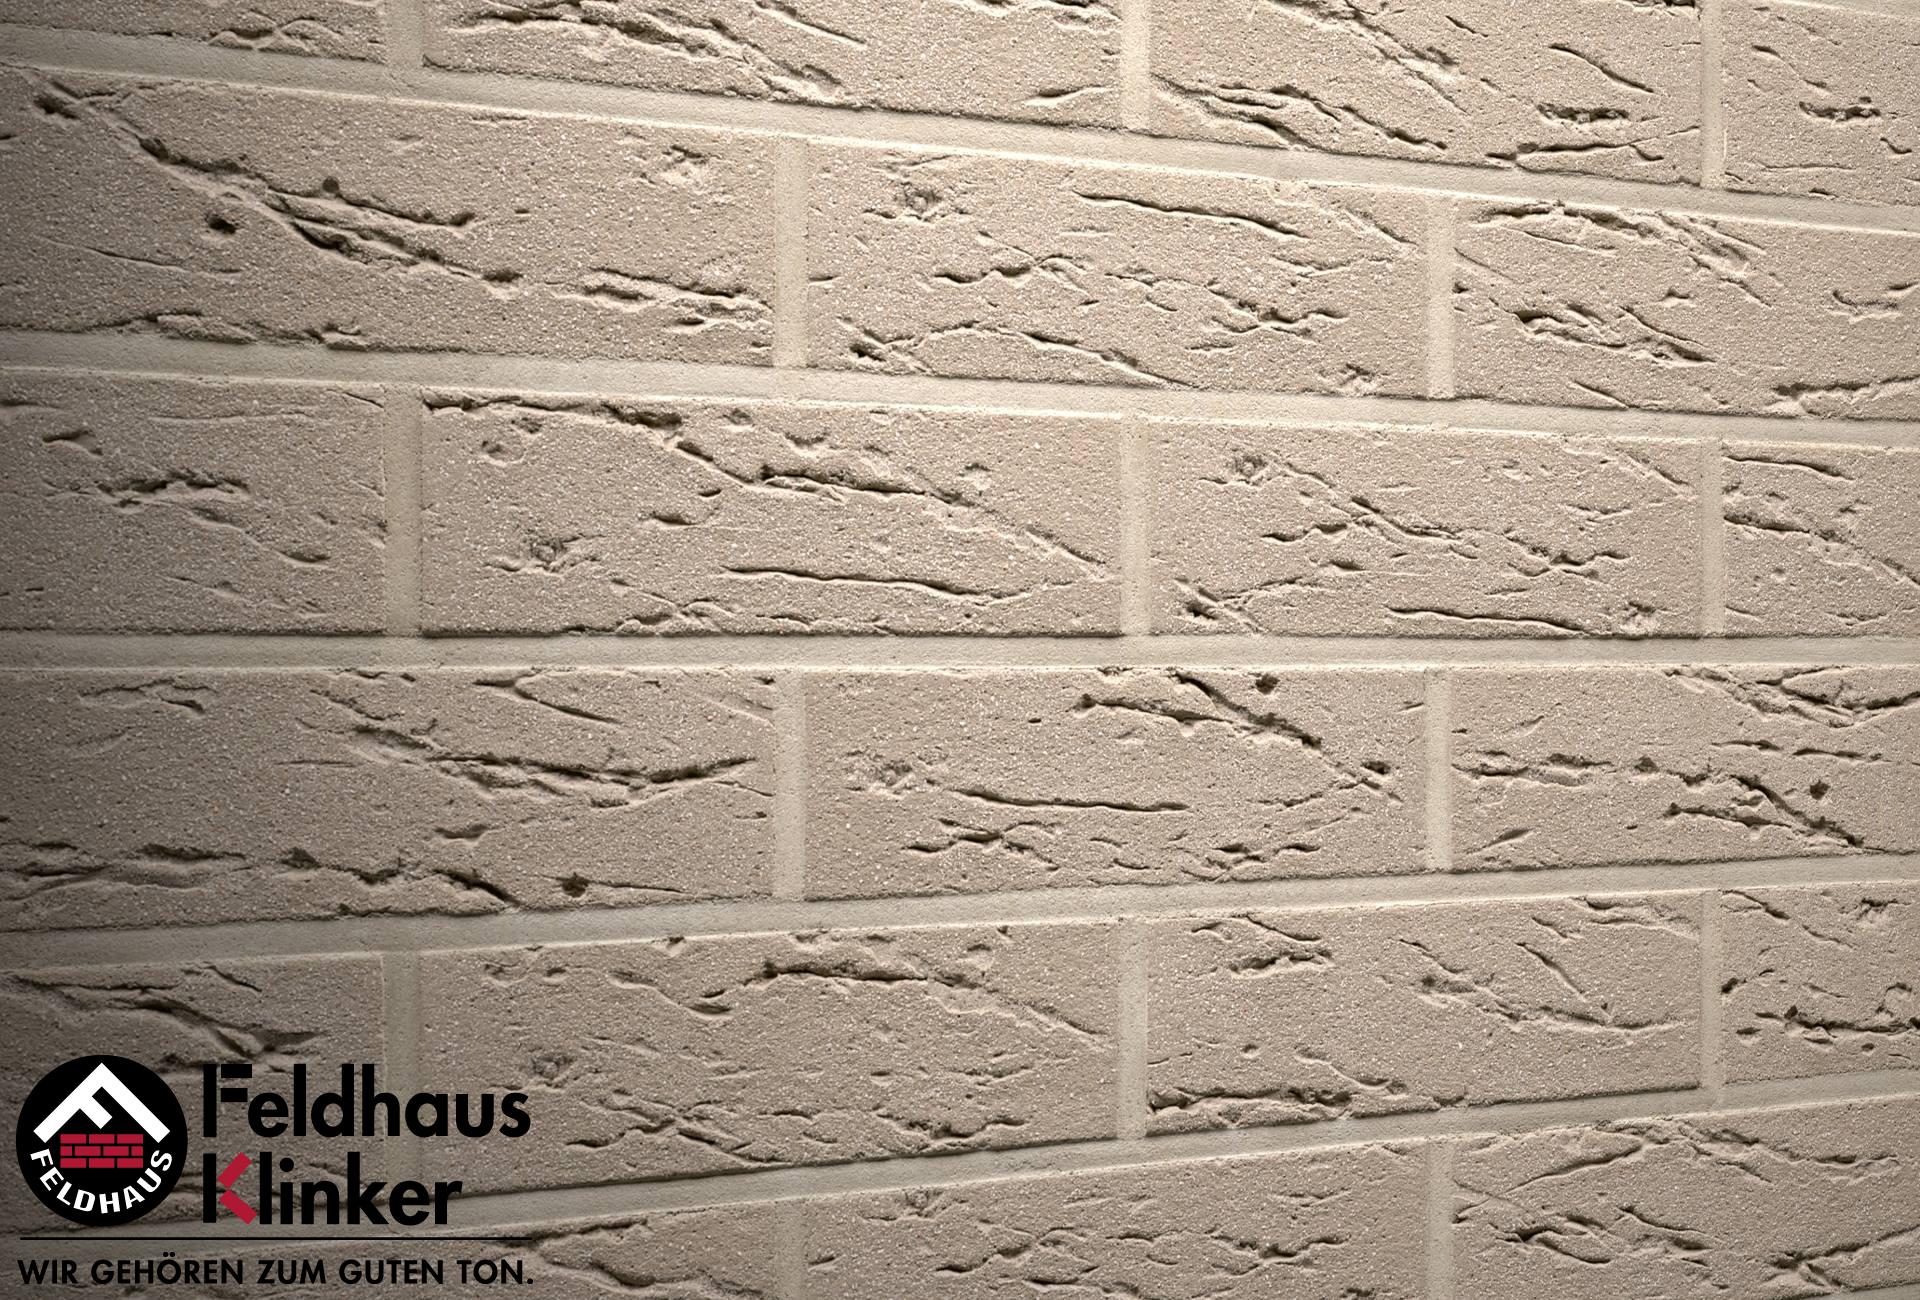 R835 Feldhaus Klinker клинкерная плитка 1